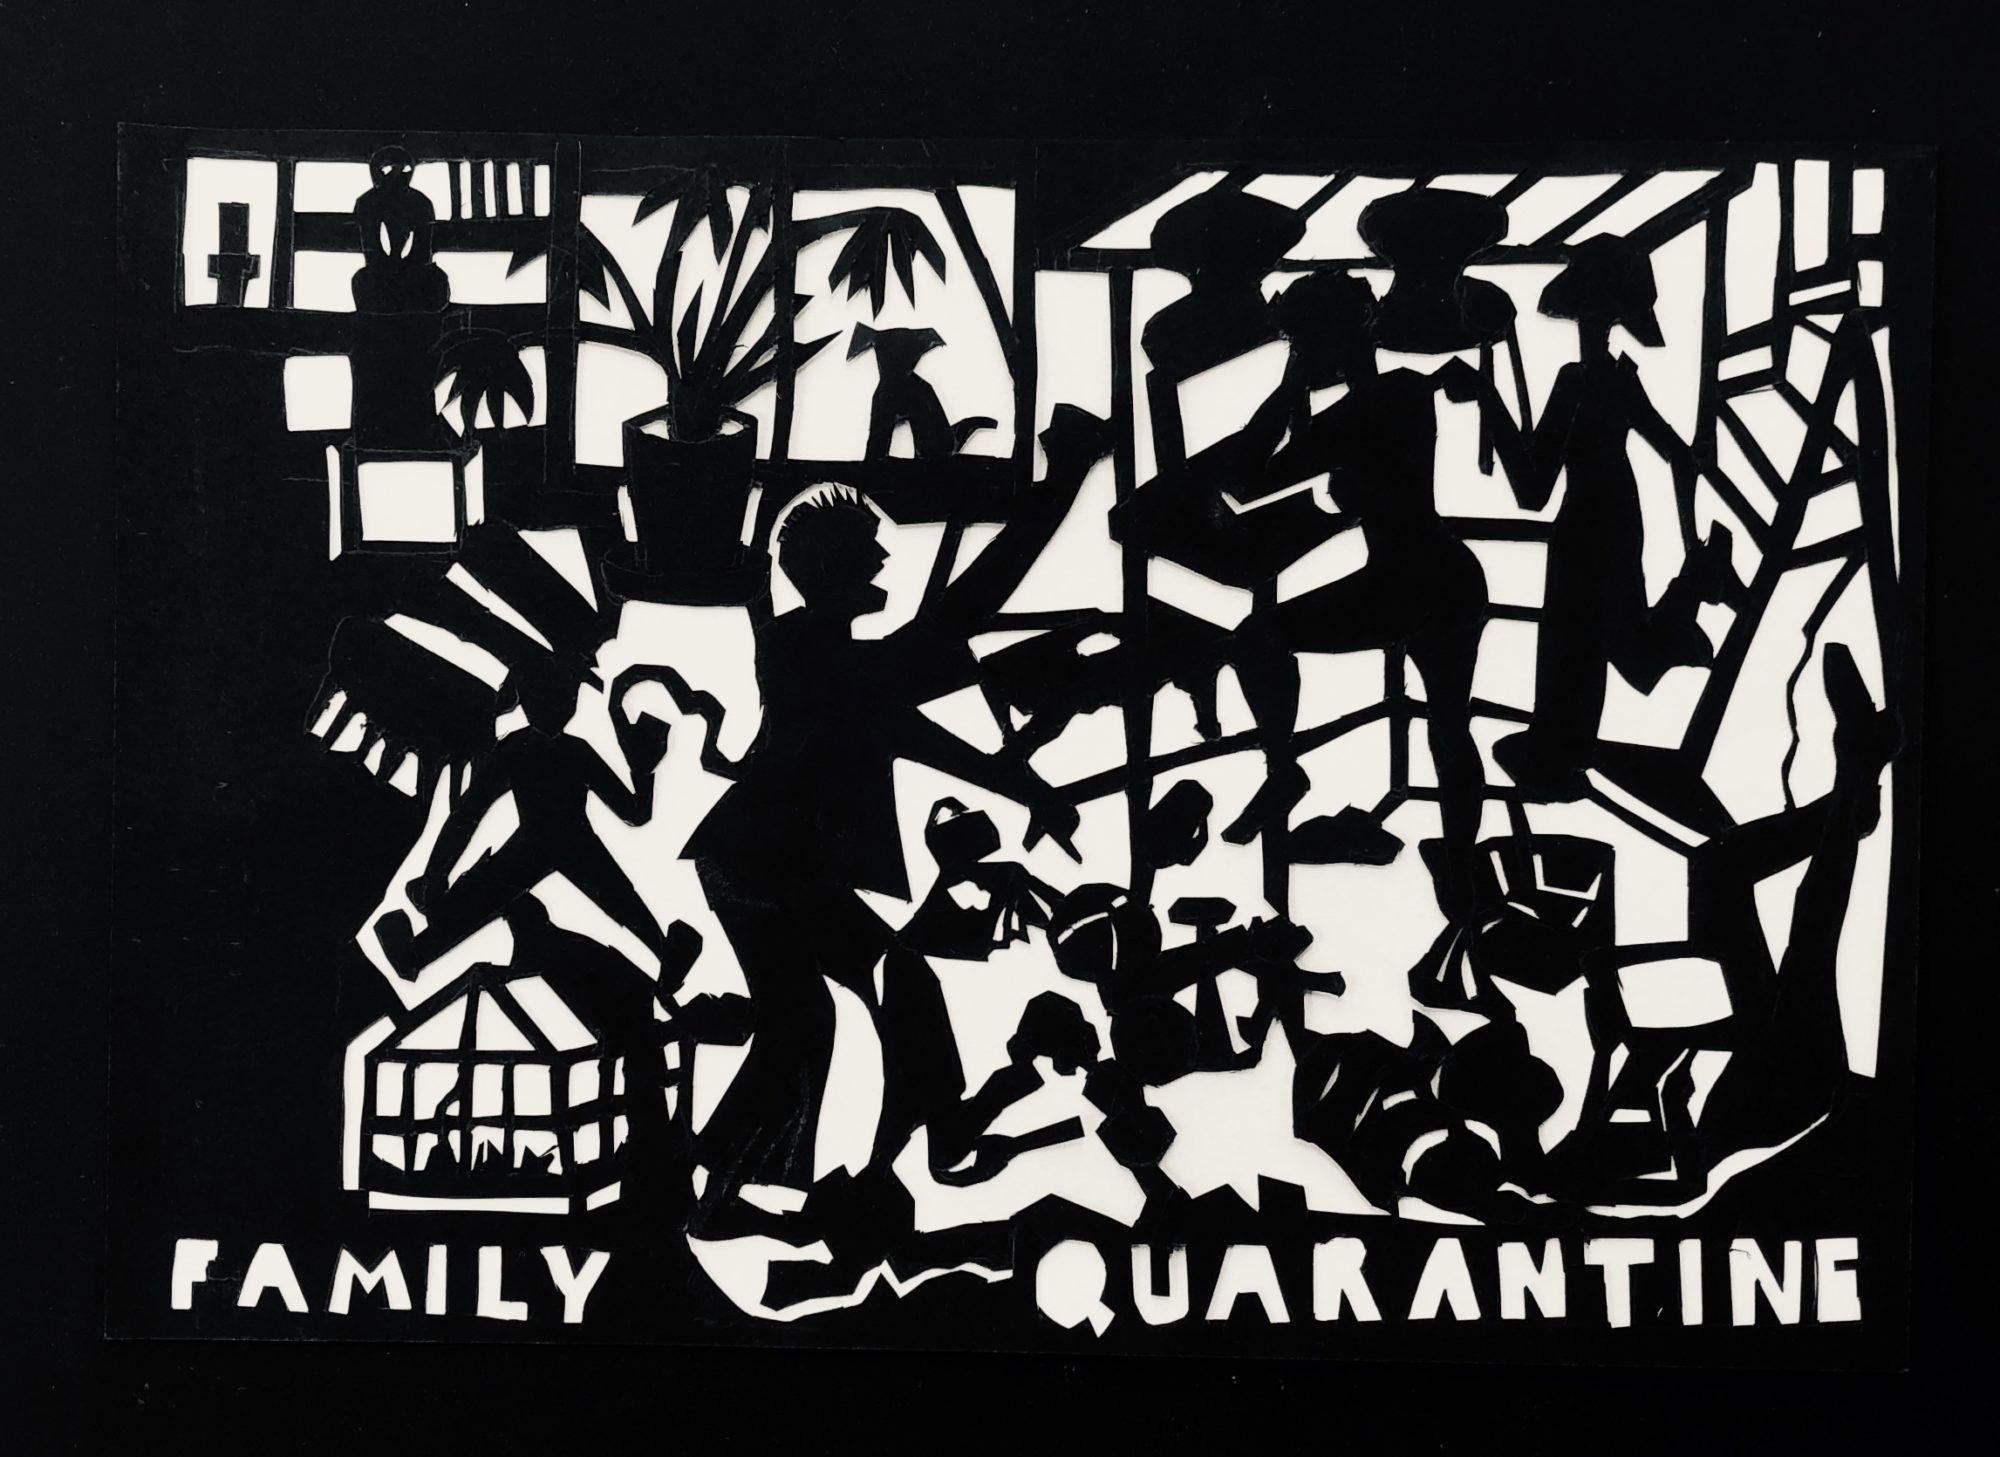 'Family Quarantine', Et Papirklip I Sort Papir. Del Af Serien, Coronabreve 2020